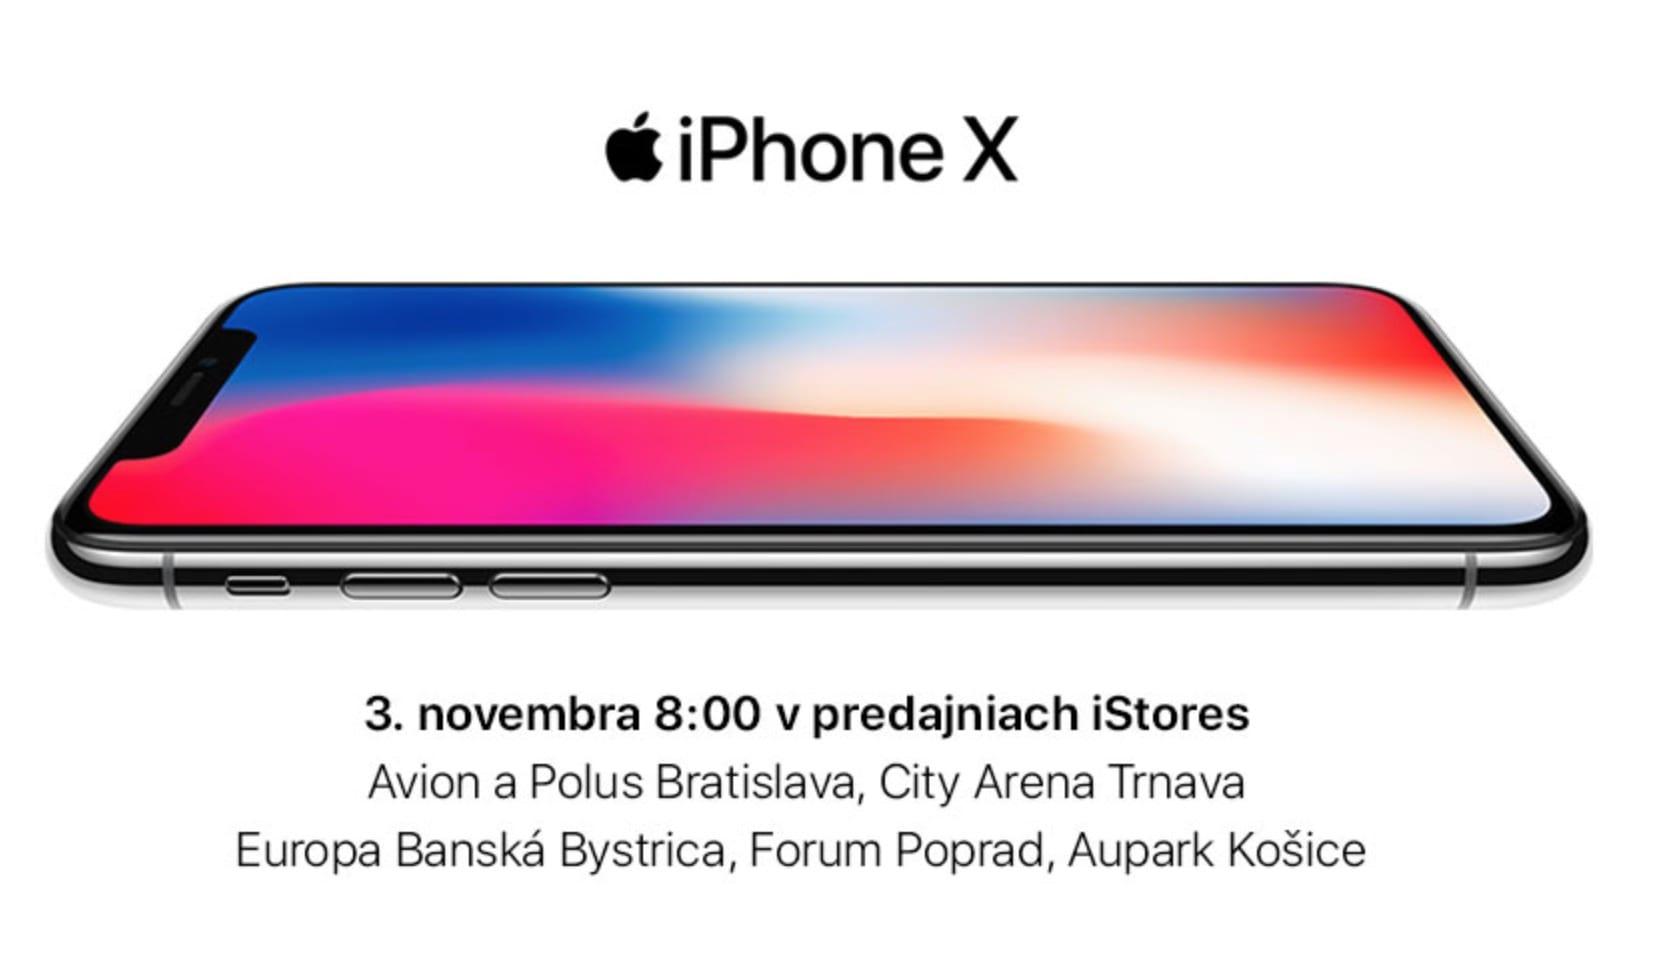 Snímka obrazovky 2017 11 02 o 15.01.38 - iPhone X už od zajtra v iStores